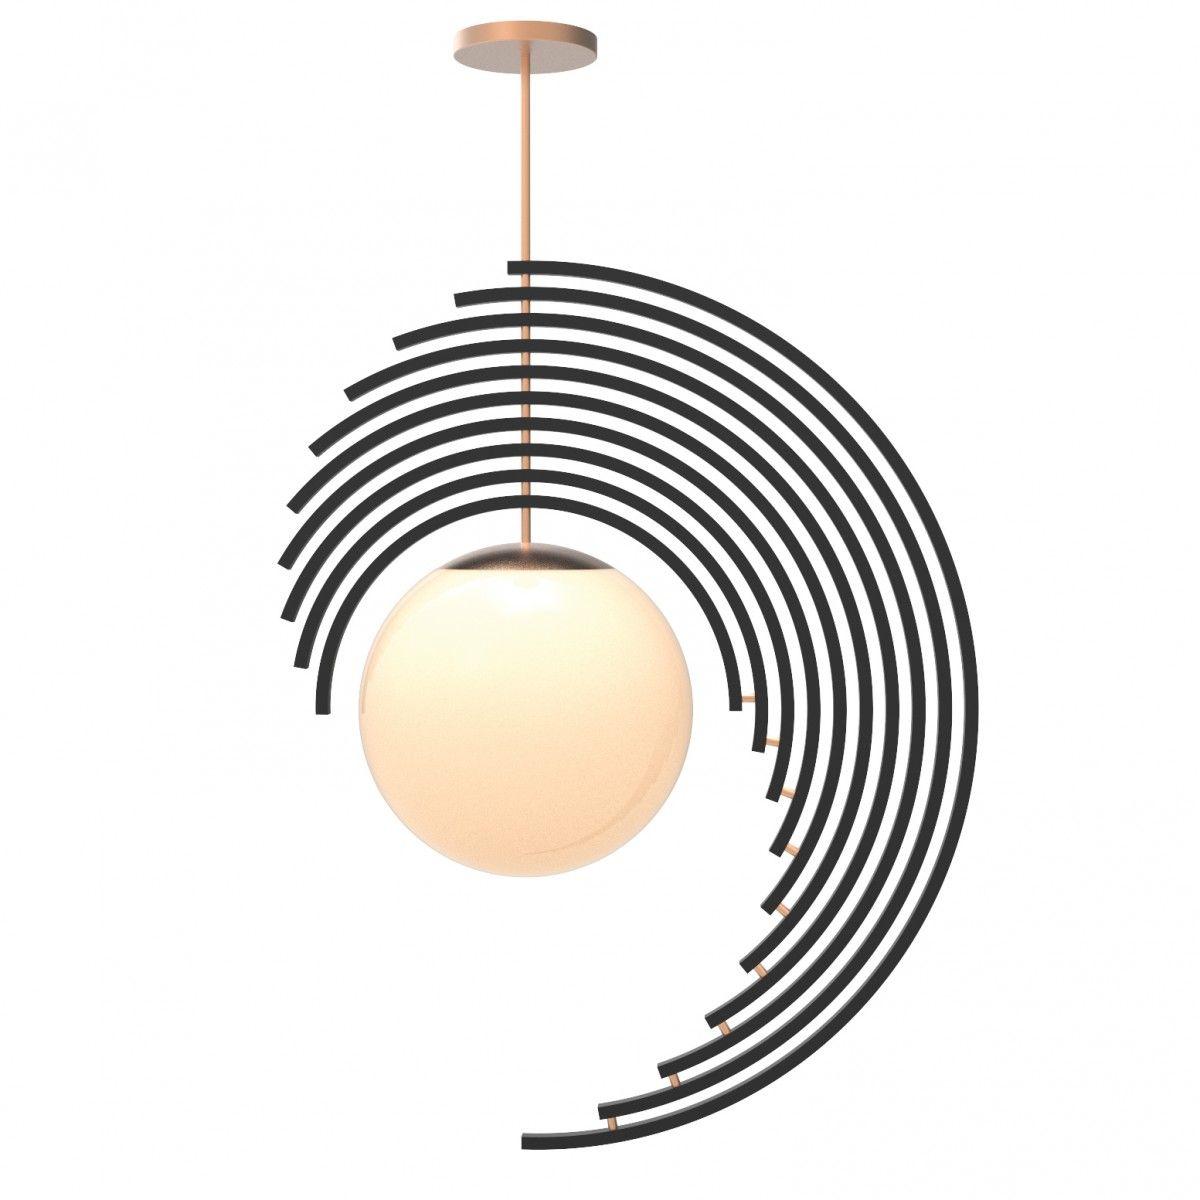 Cc5979 Aureole Pendant Mario Contract Lighting Metzger